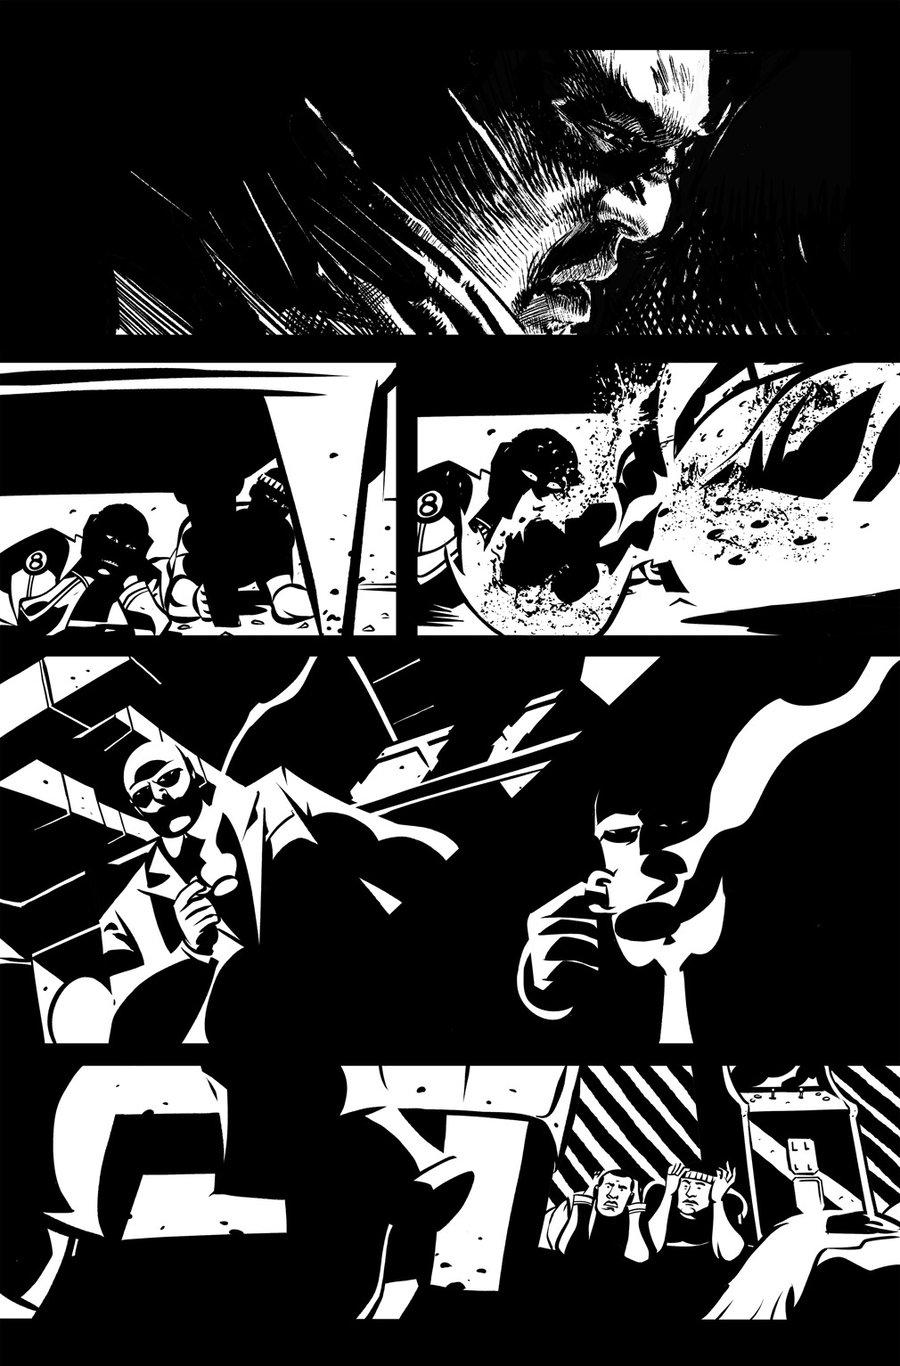 Image of DEFENDERS #8, p.07 ARTIST'S PROOF